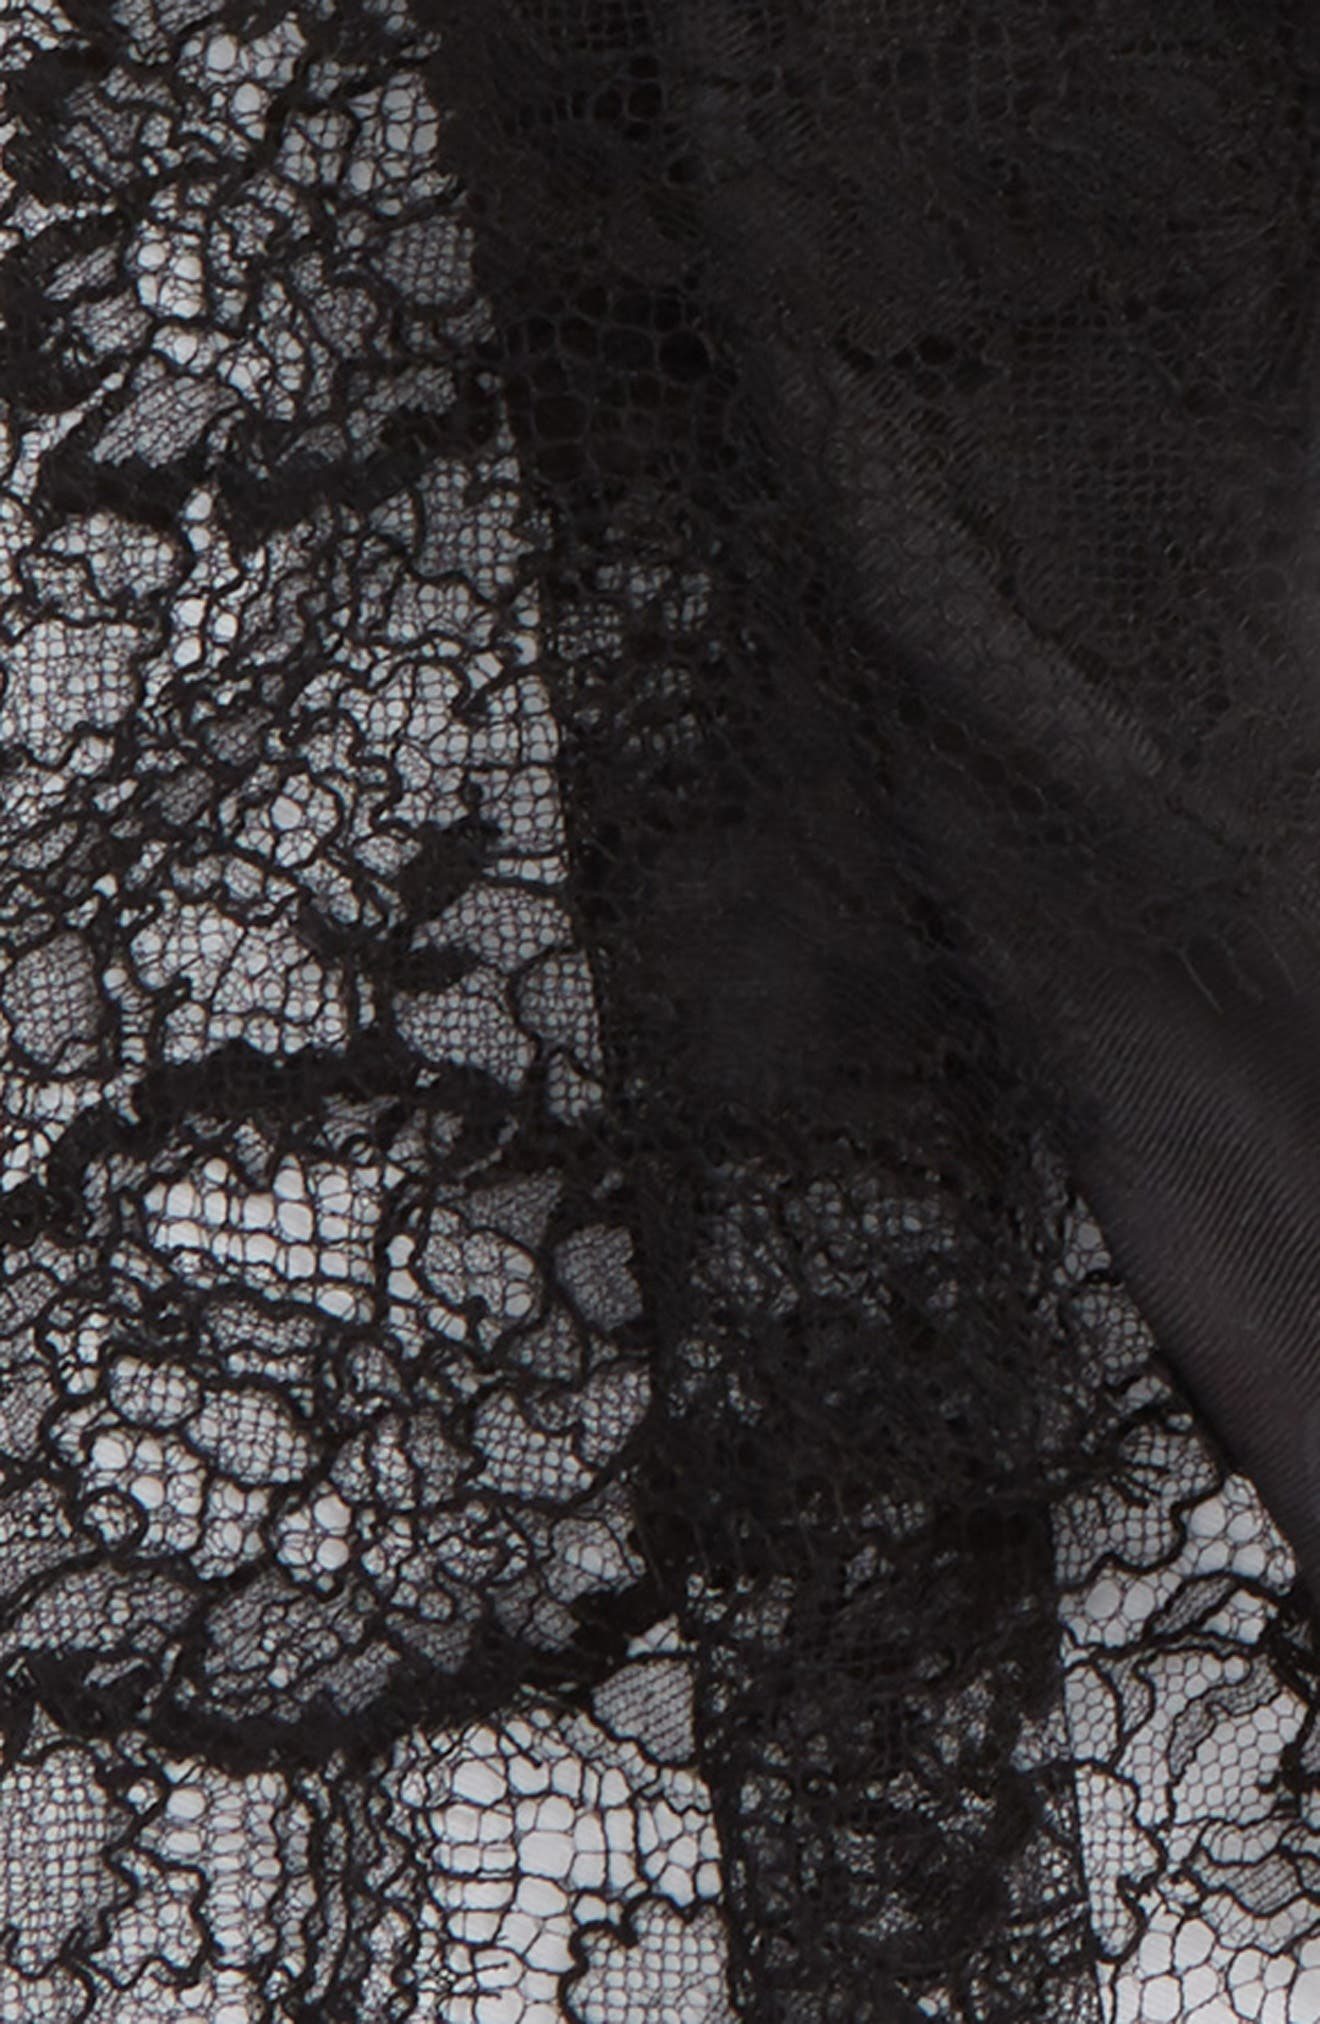 Lace Trim Modal & Cashmere Scarf,                             Alternate thumbnail 3, color,                             Nero/ Nero